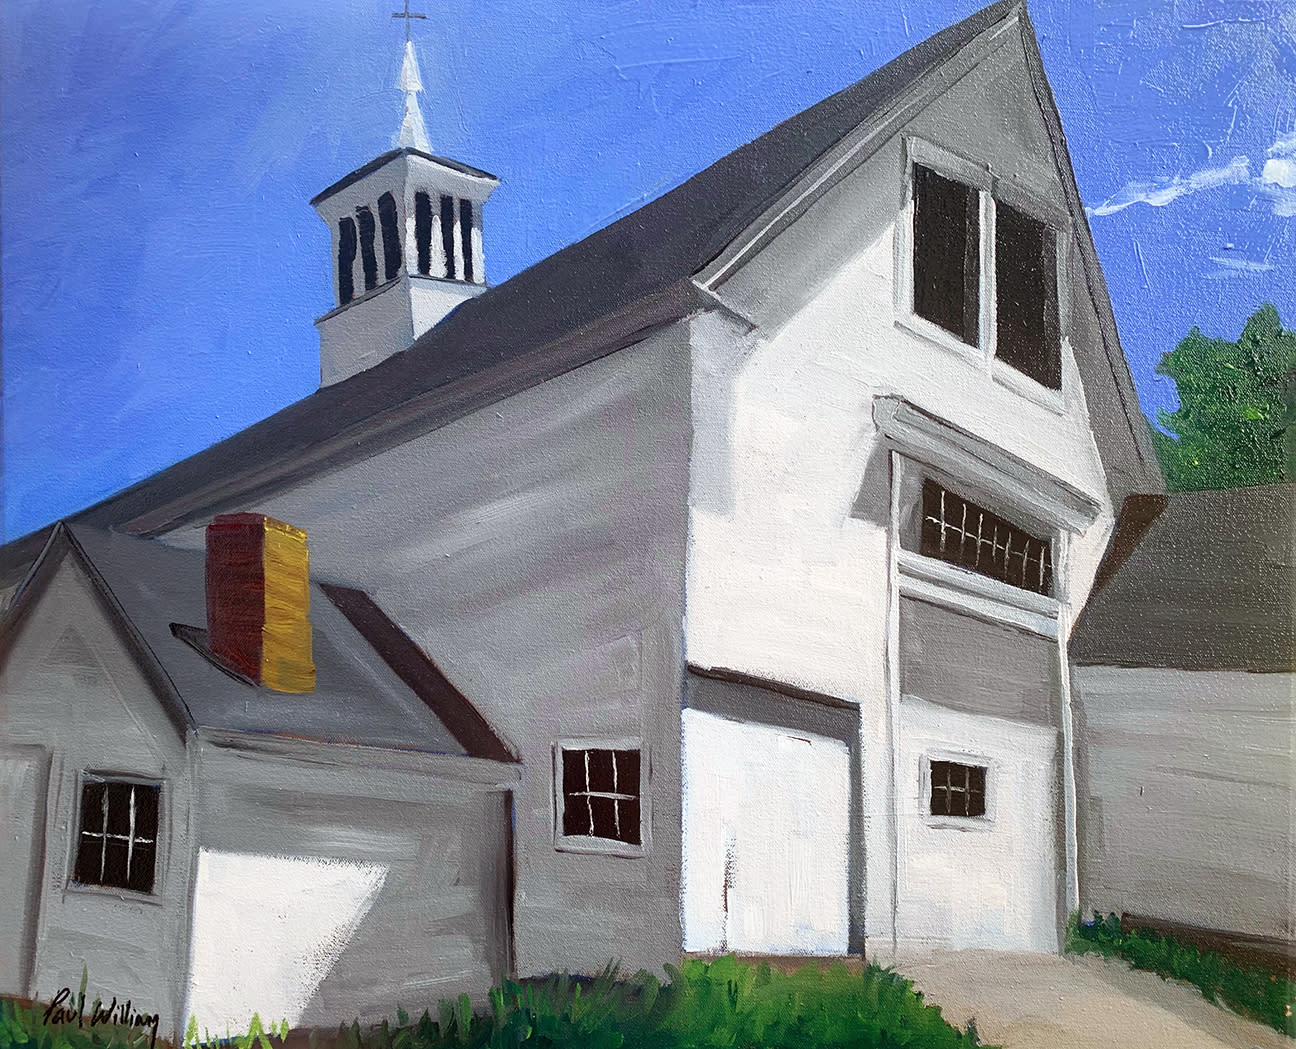 Summer barn in lincoln by paul william artist kpv3h4